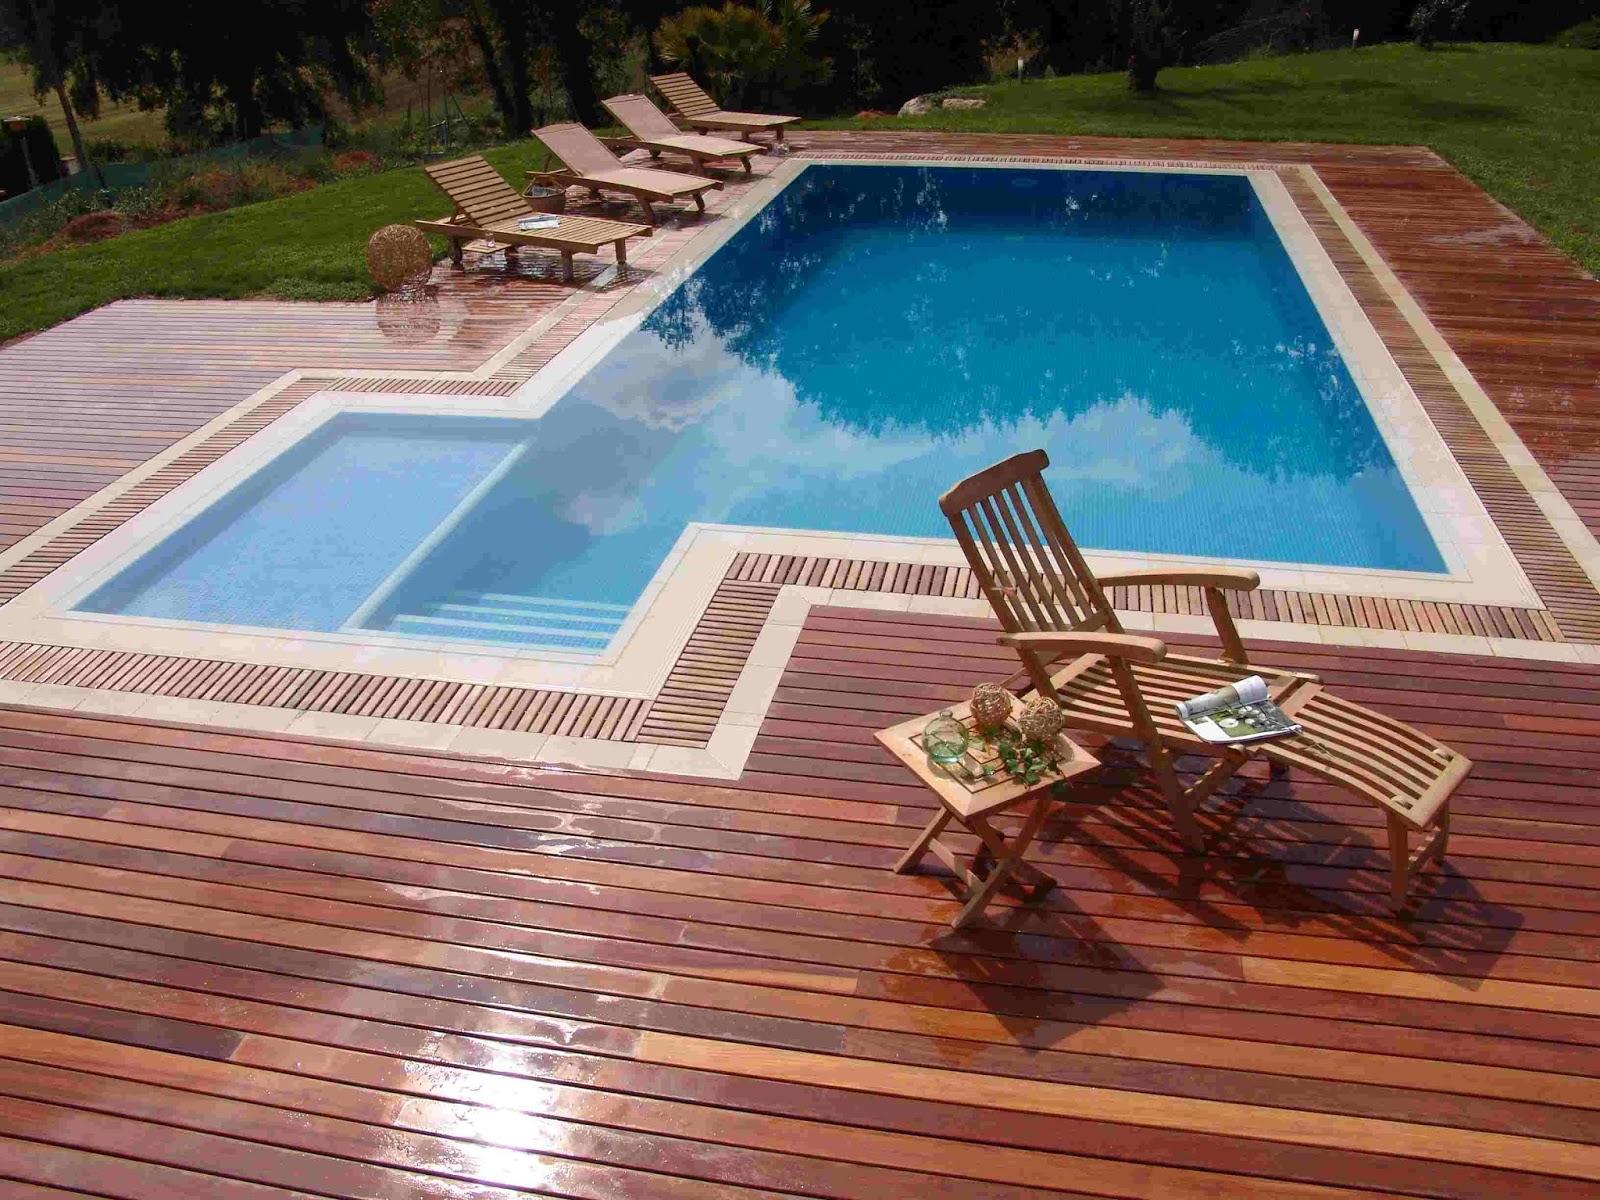 Any other world proyecto 2013 superado for Limpieza piscinas